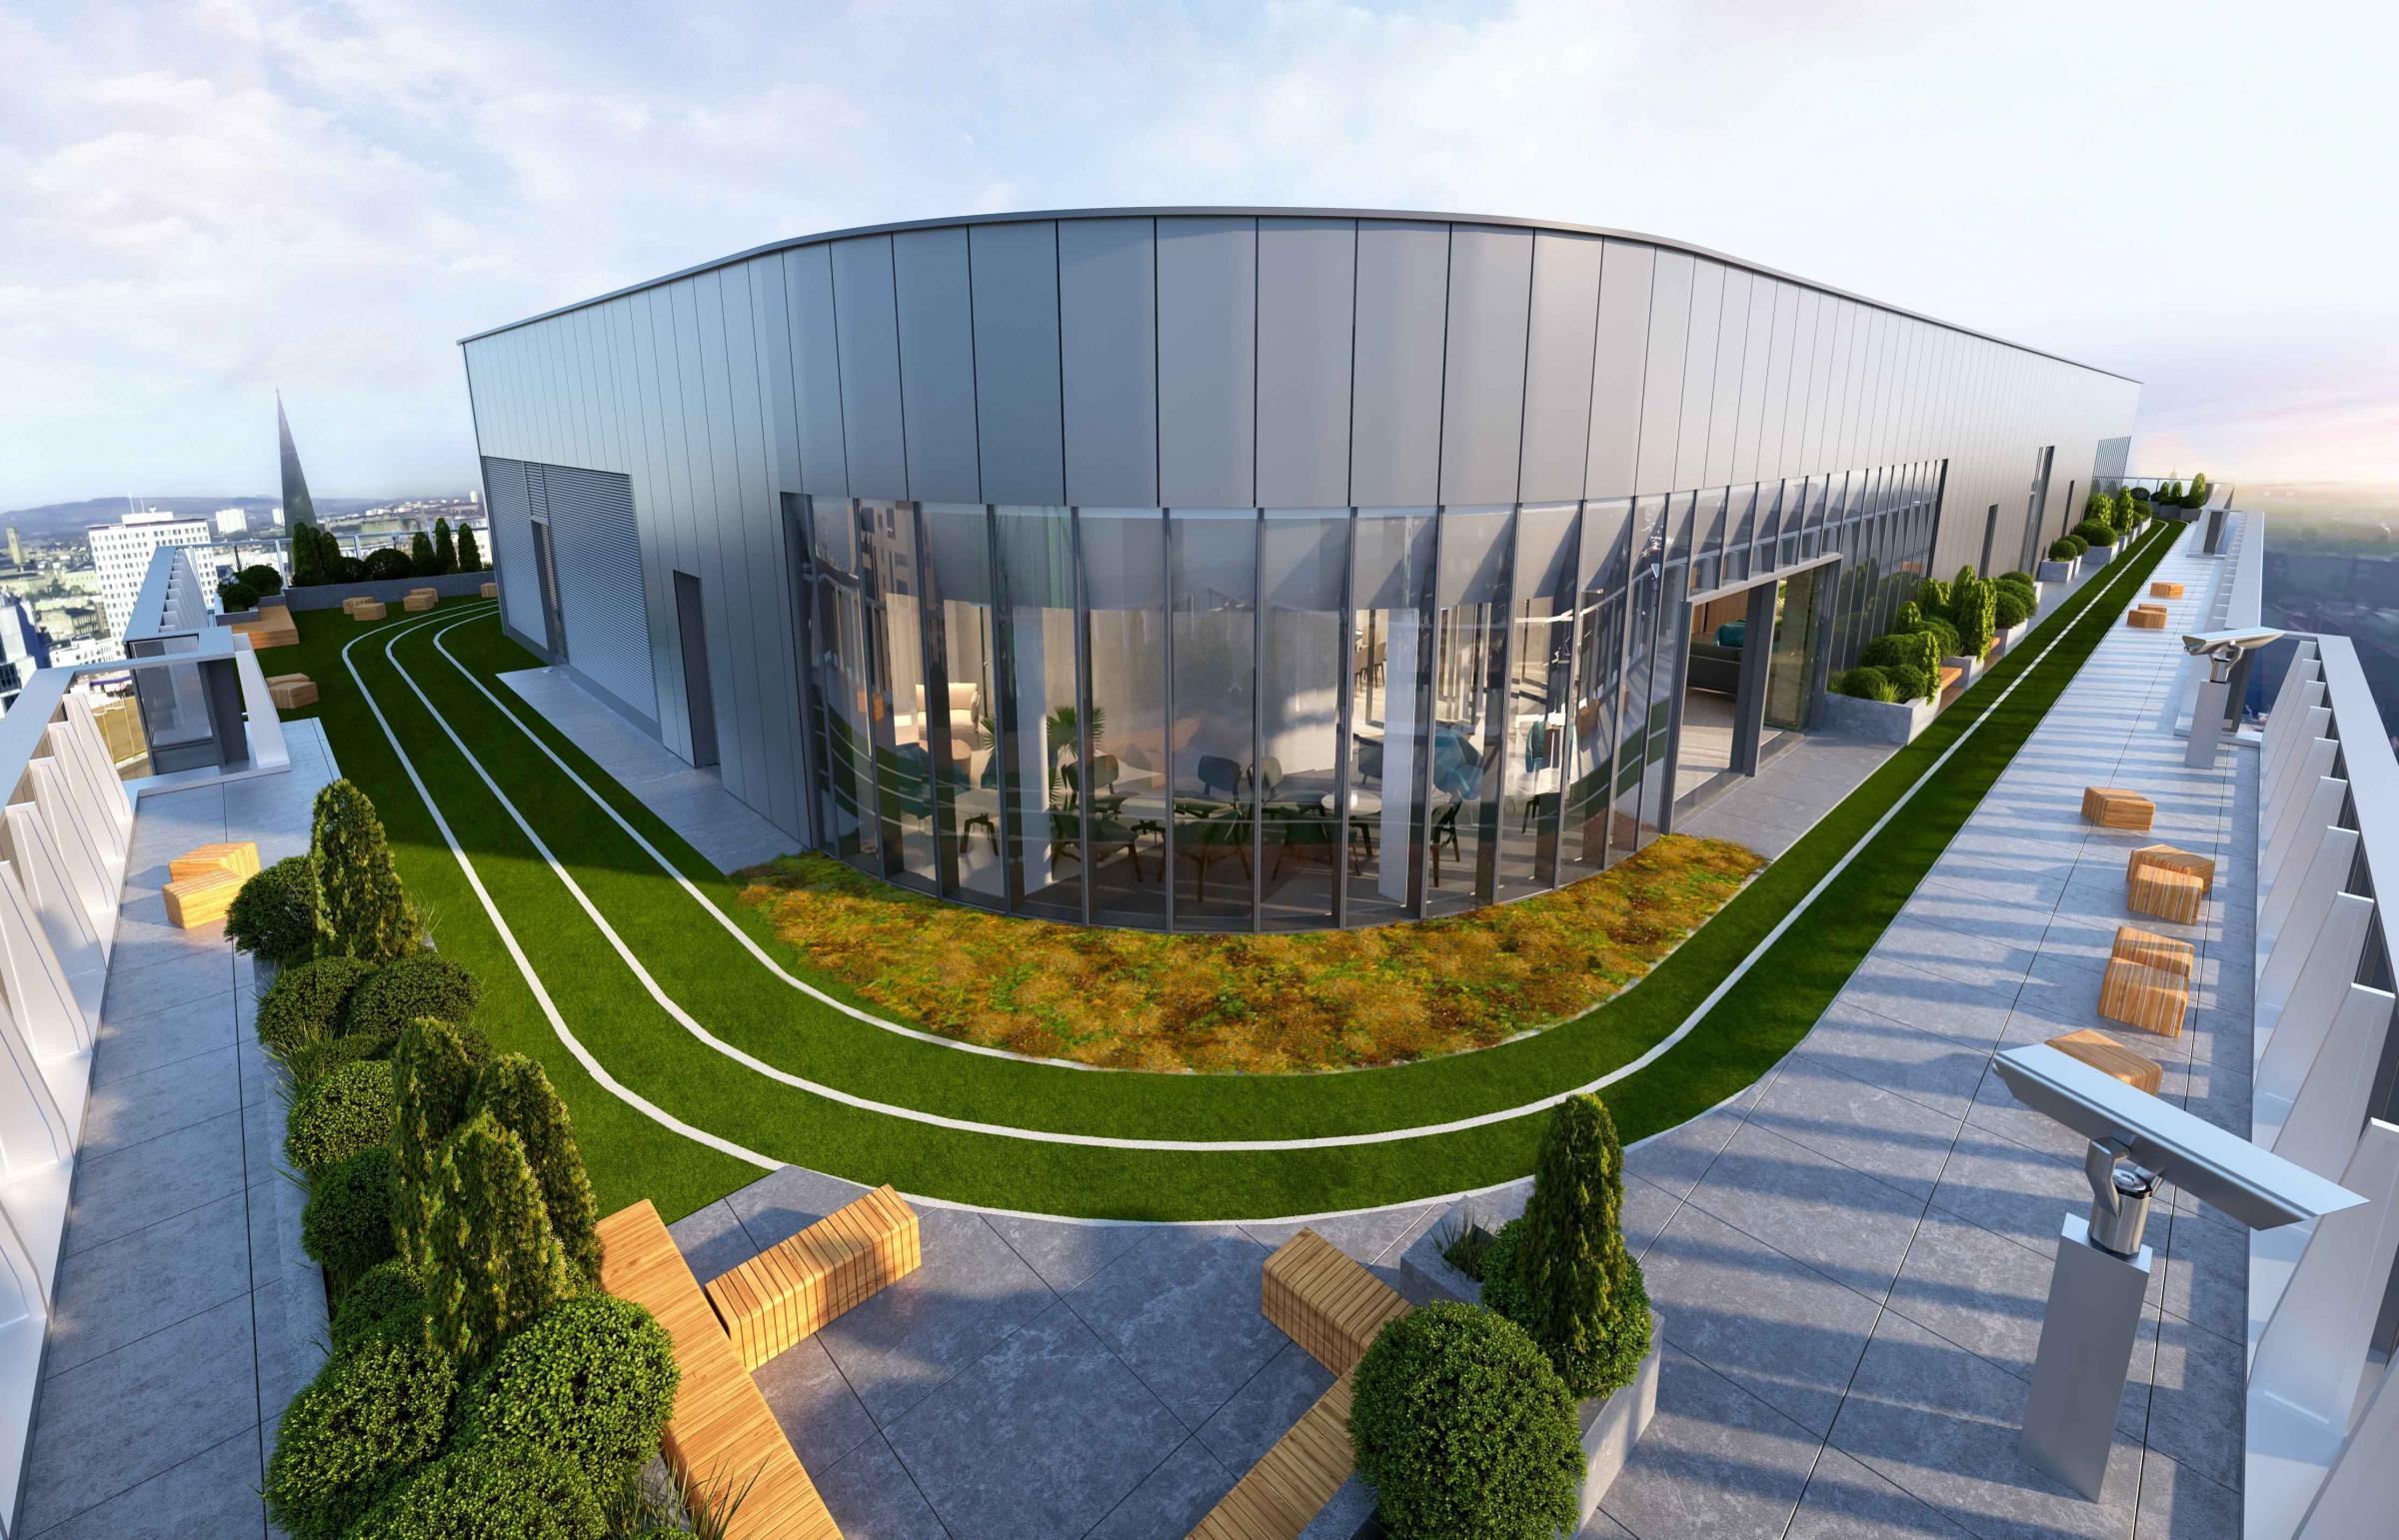 BNP Paribas to locate staff in new Bothwell Street building in Glasgow